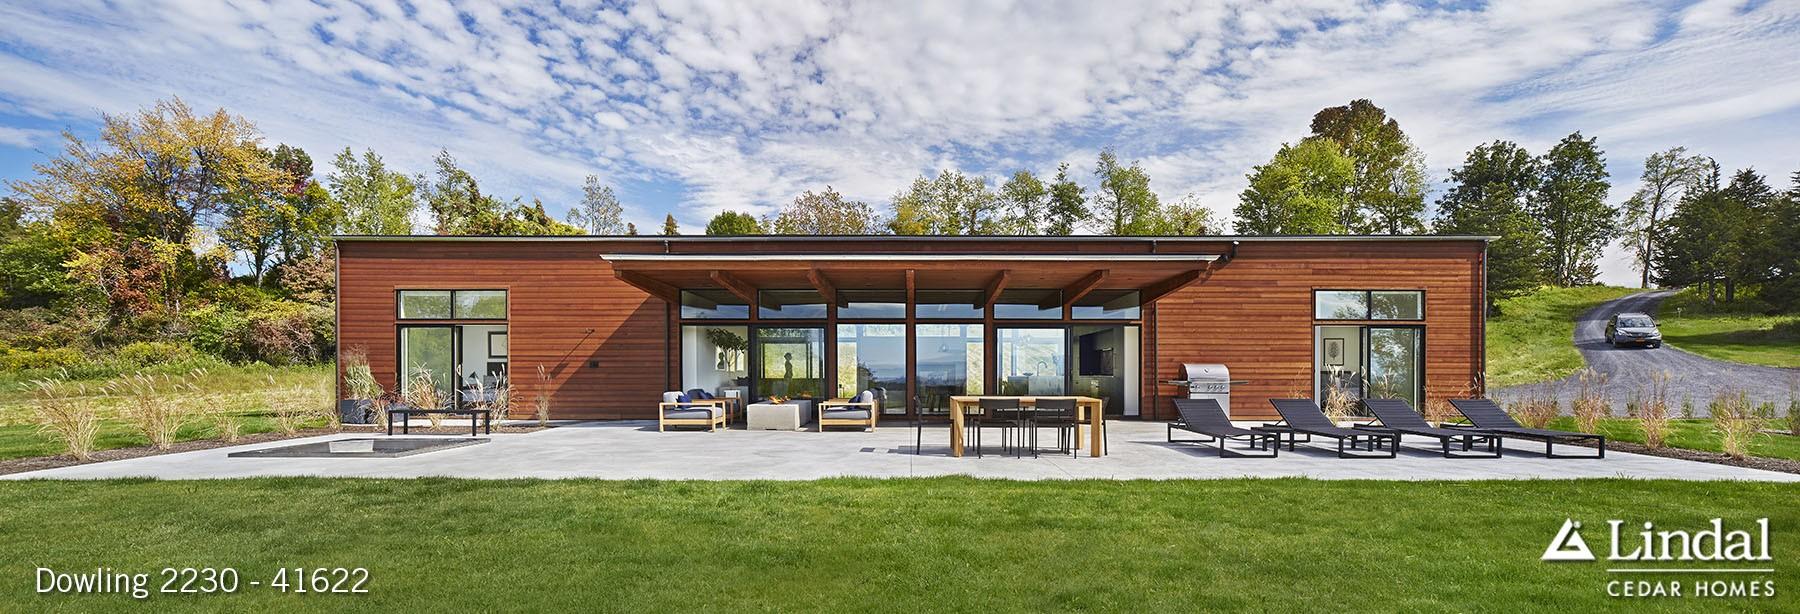 Lindal Cedar Homes Linkedin